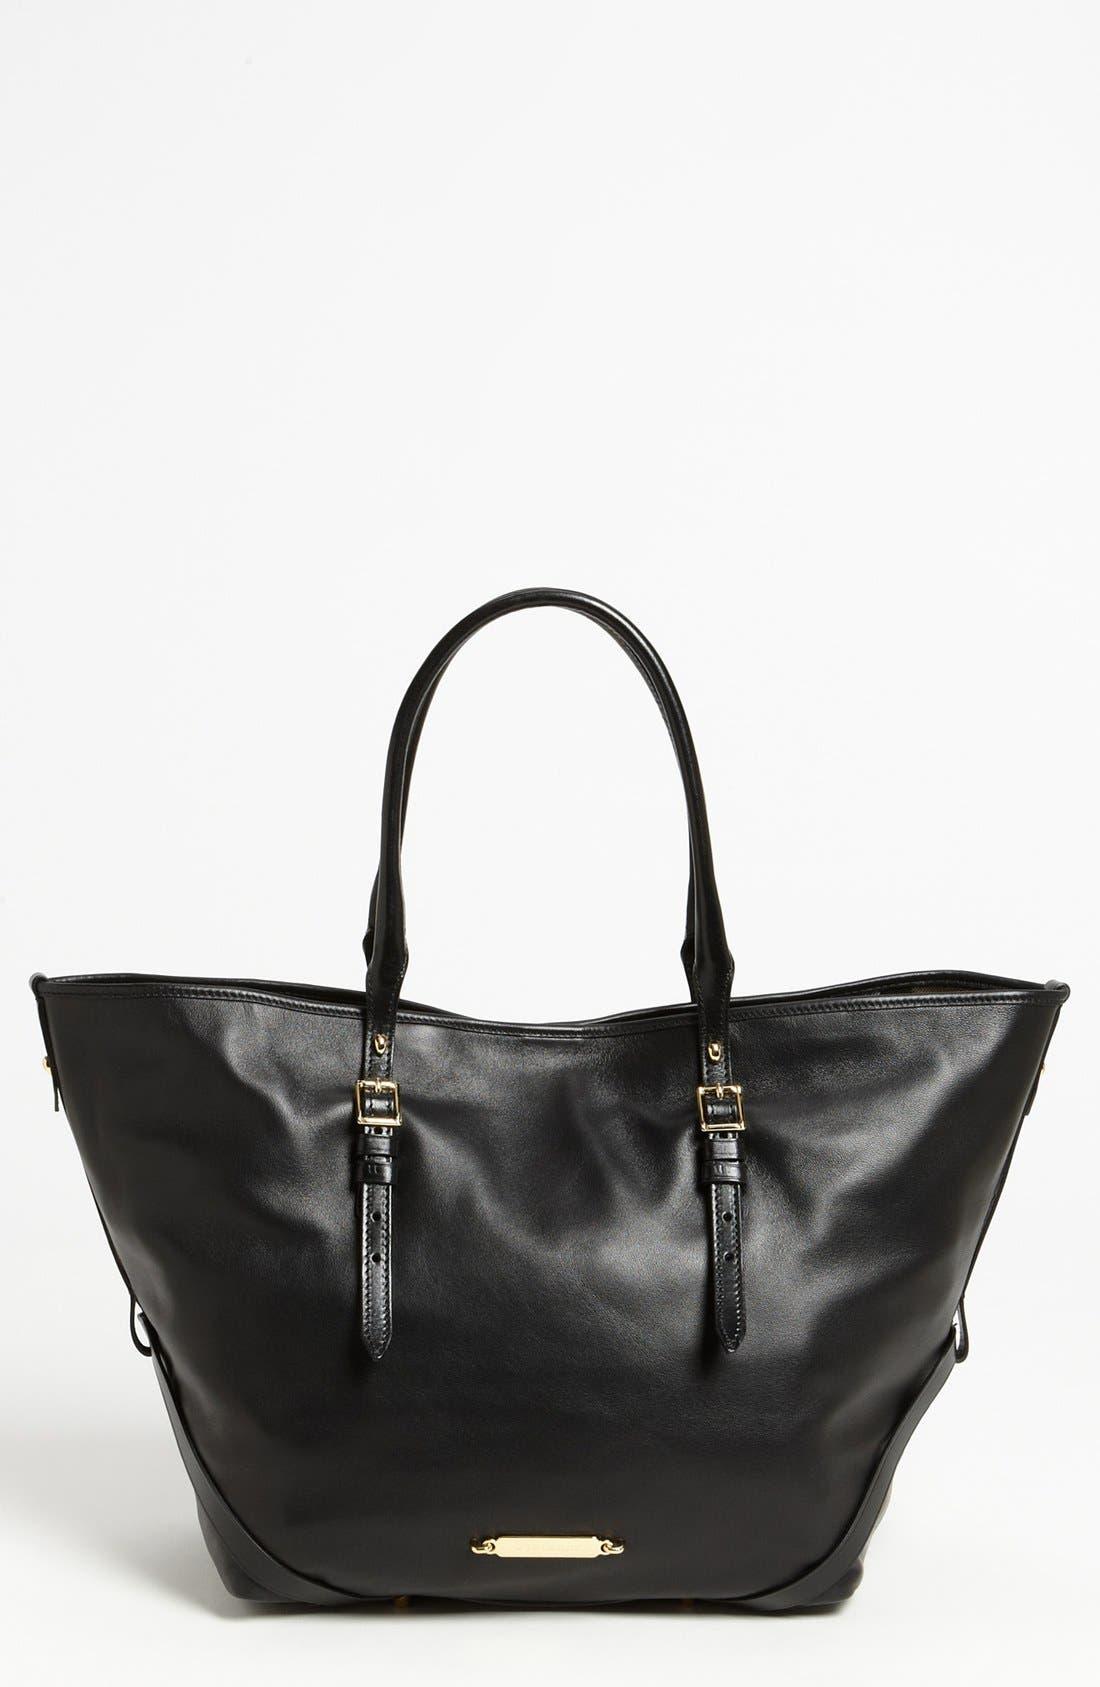 Main Image - Burberry 'Medium Bridle' Leather Tote